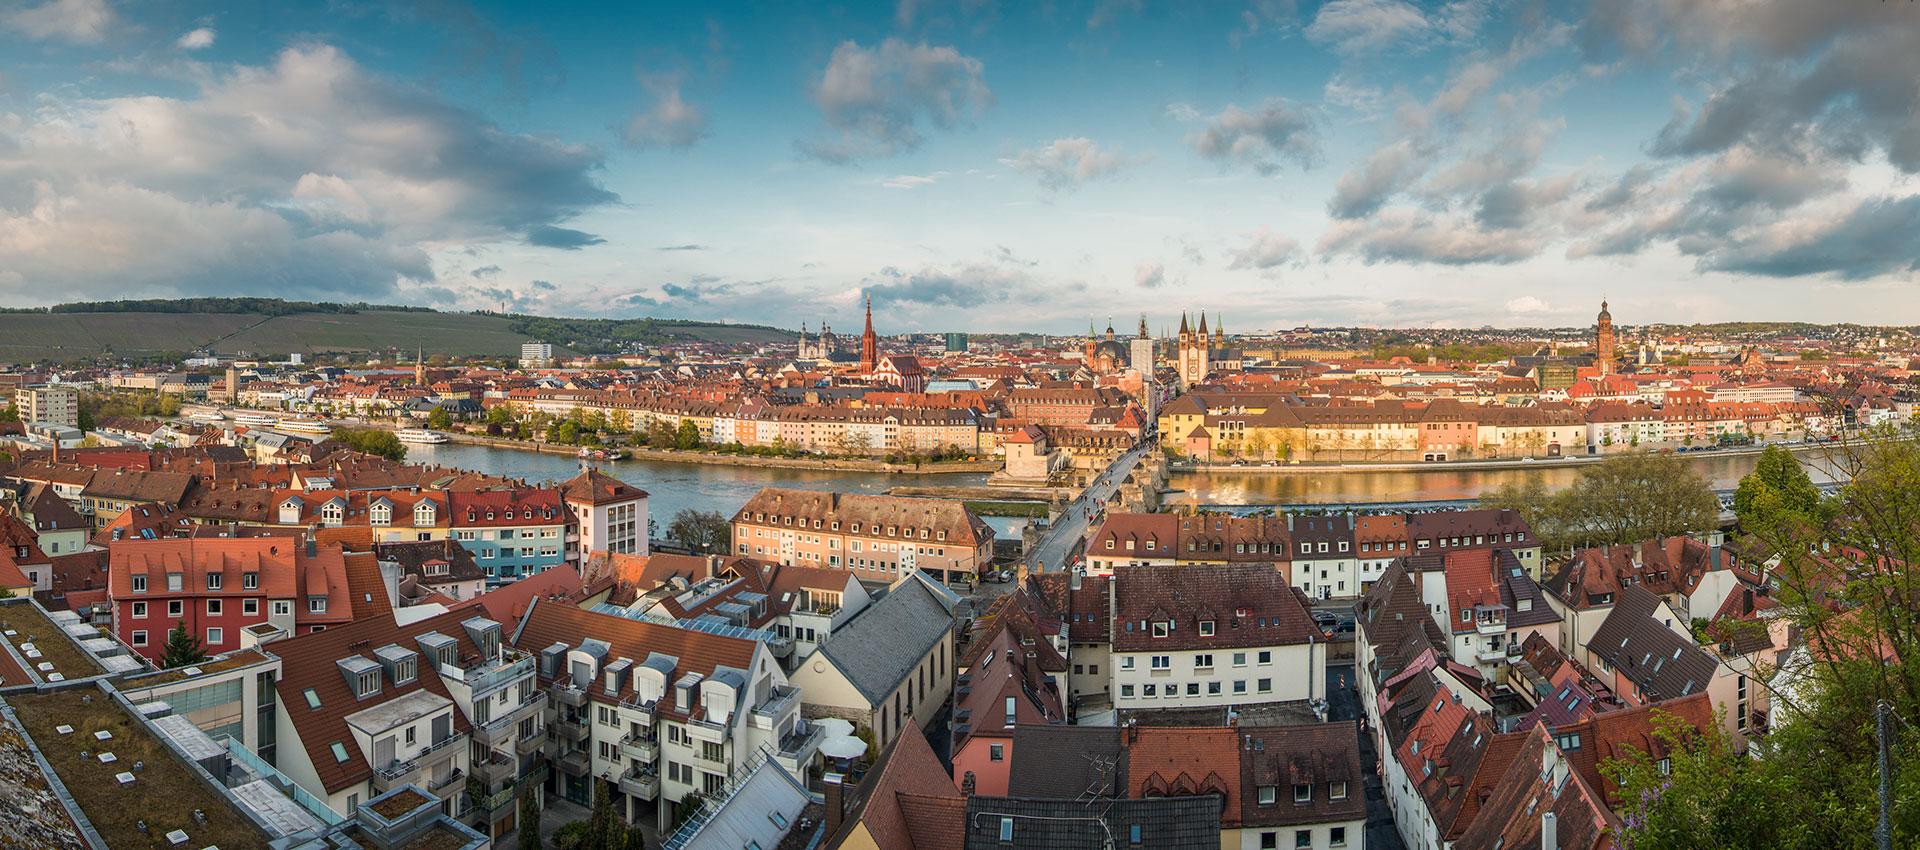 Würzburg Frühling Abend